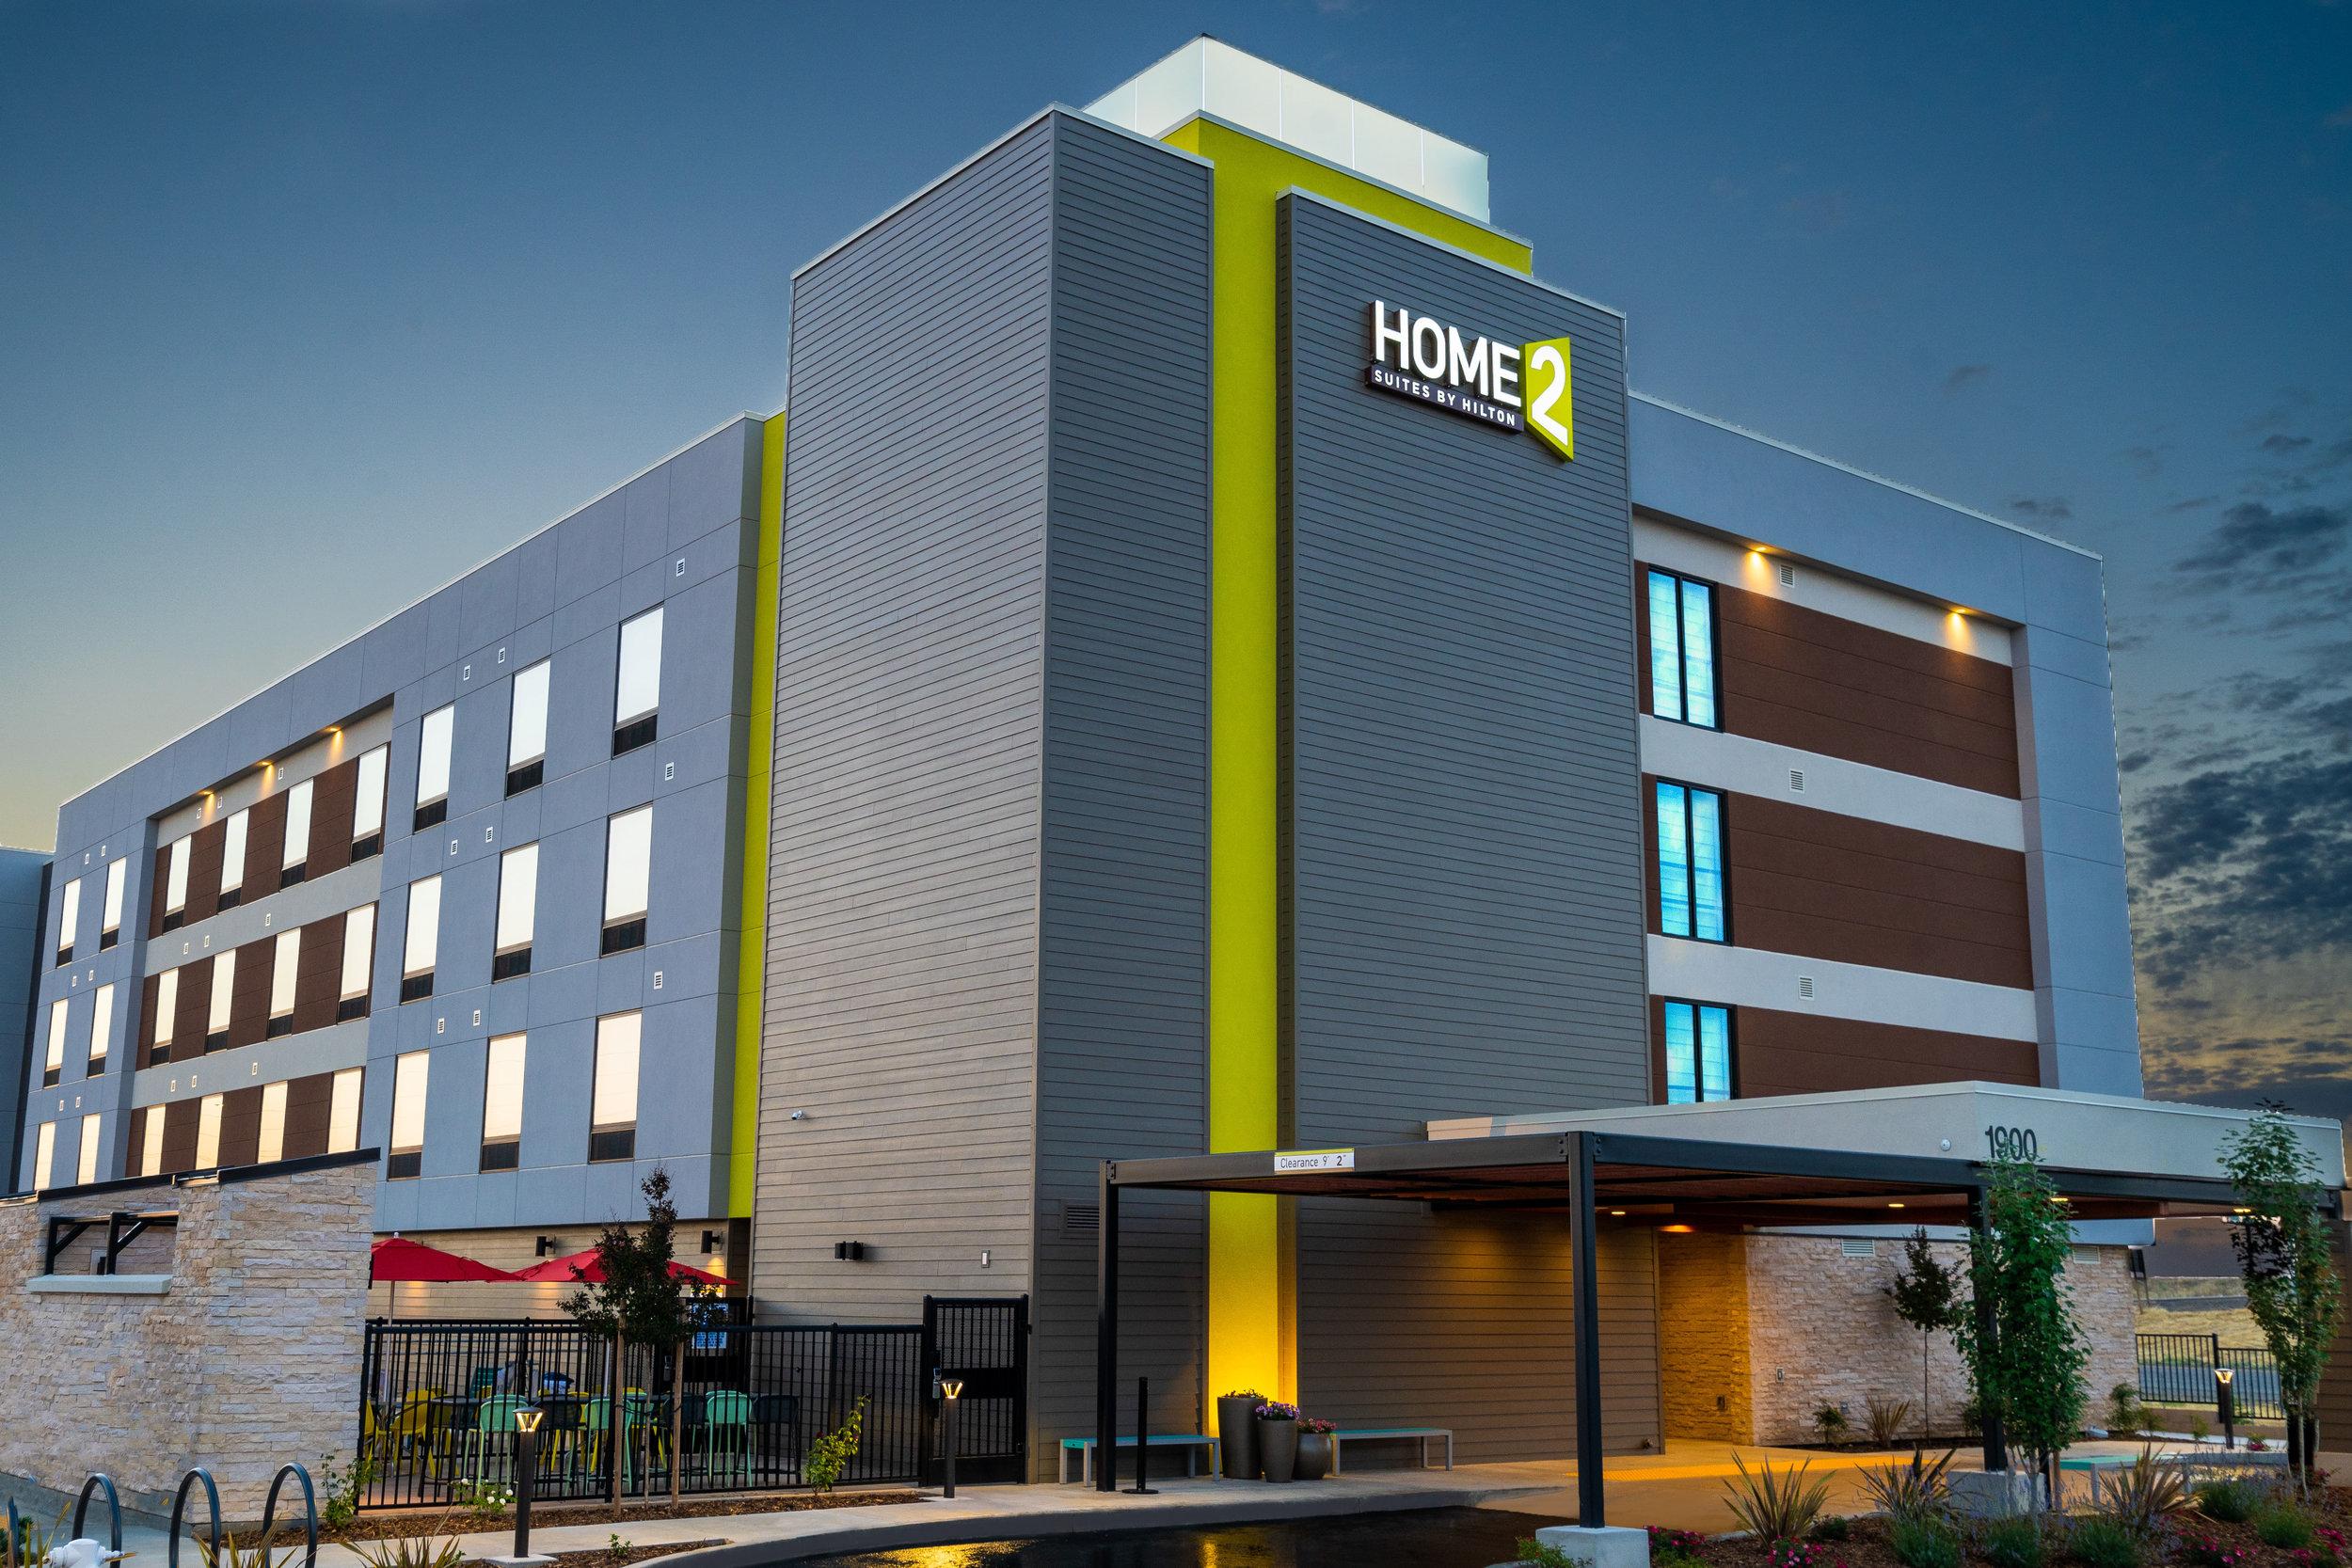 roseville-home-2-suites-exterior-night-V2.jpg